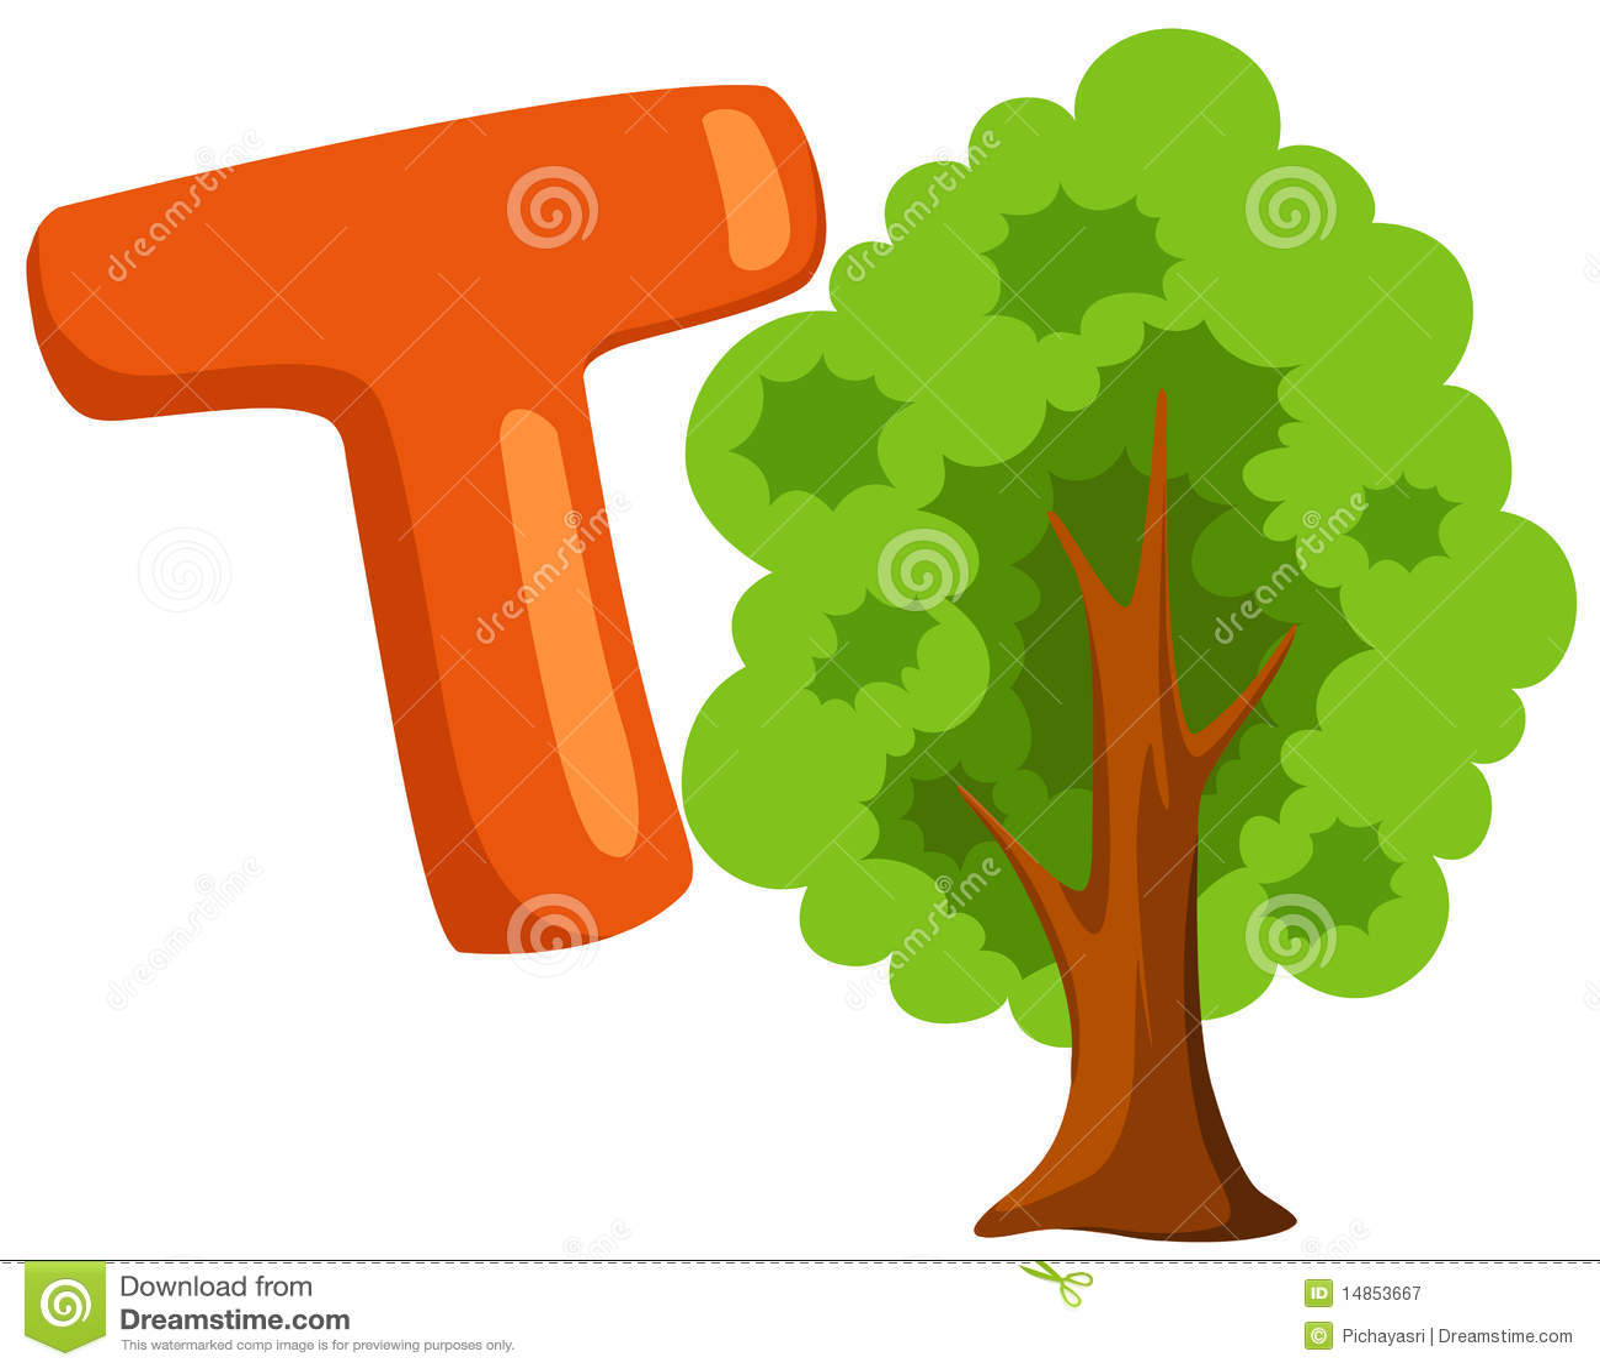 Alphabet T For Tree Stock Vector Illustration Of Learn